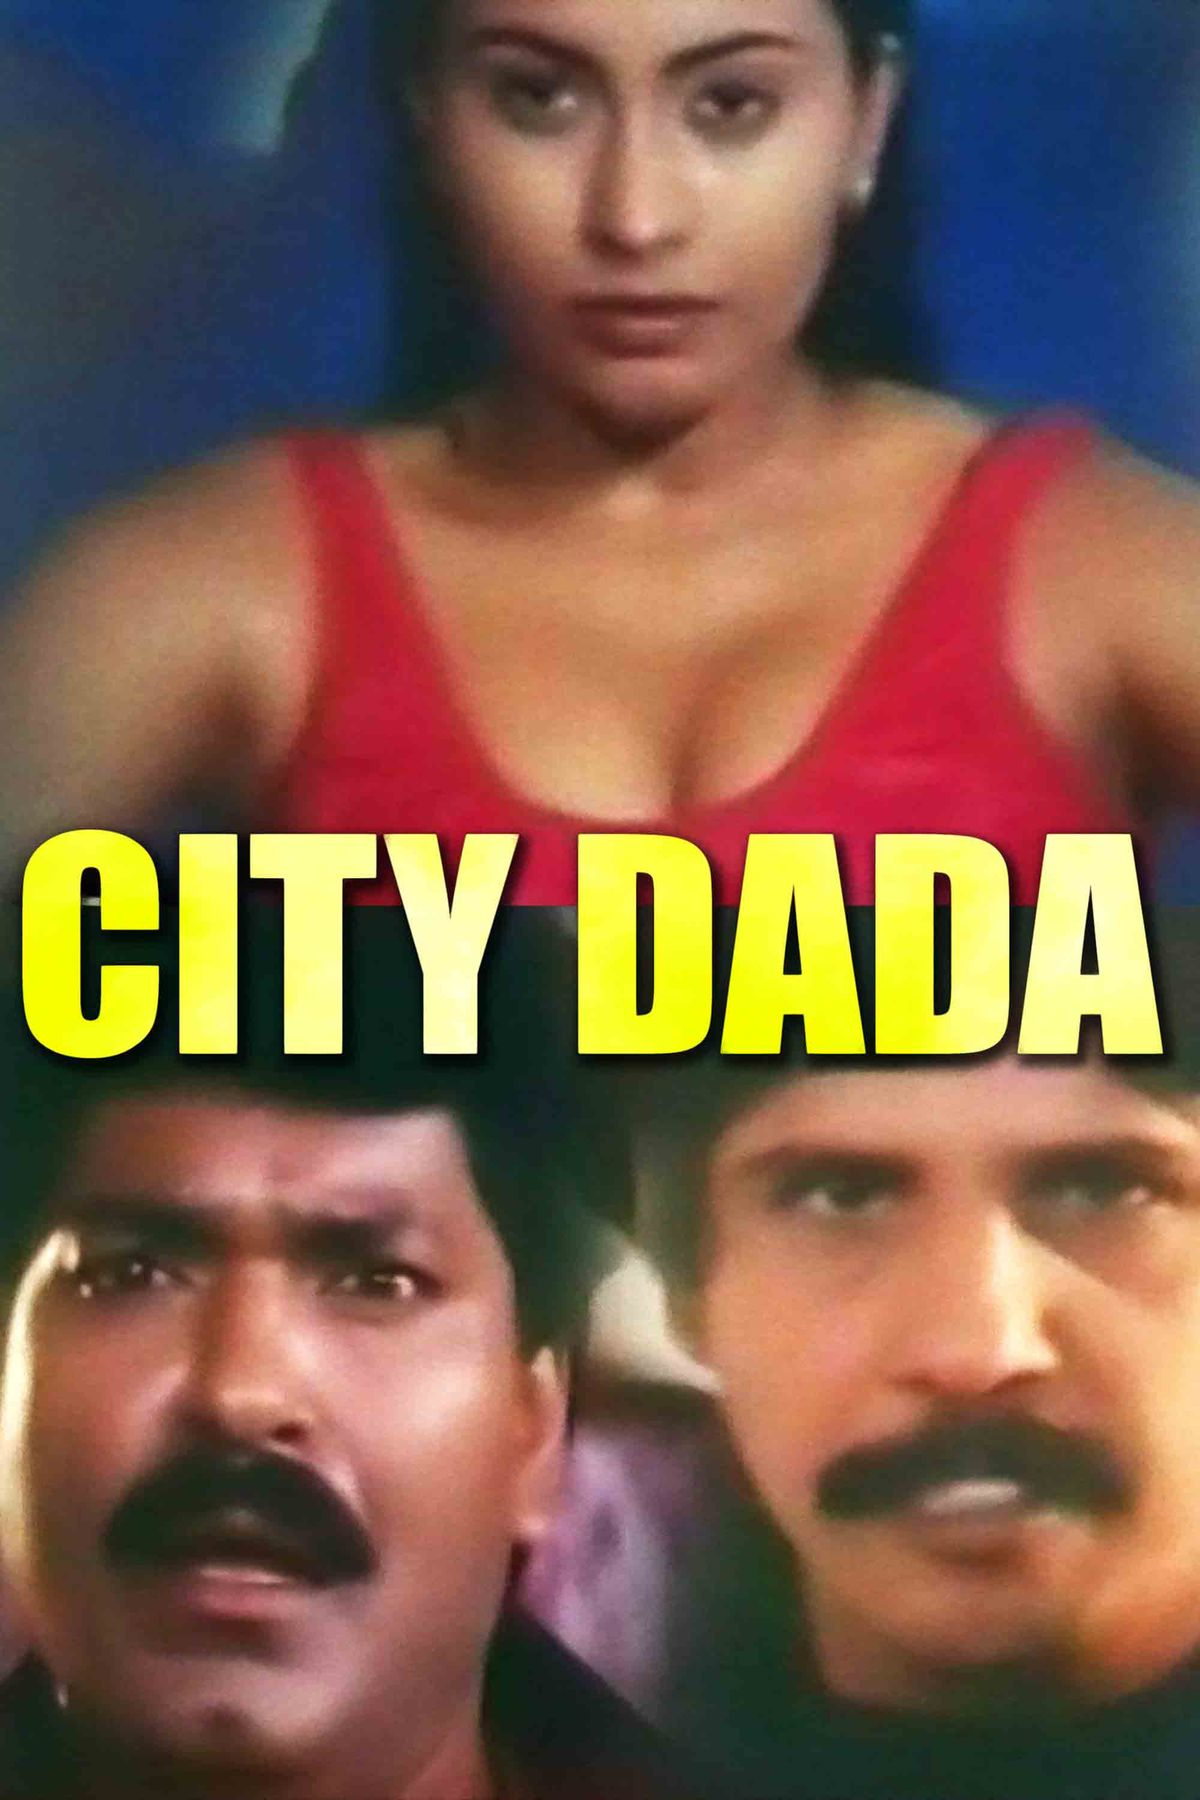 City Dada